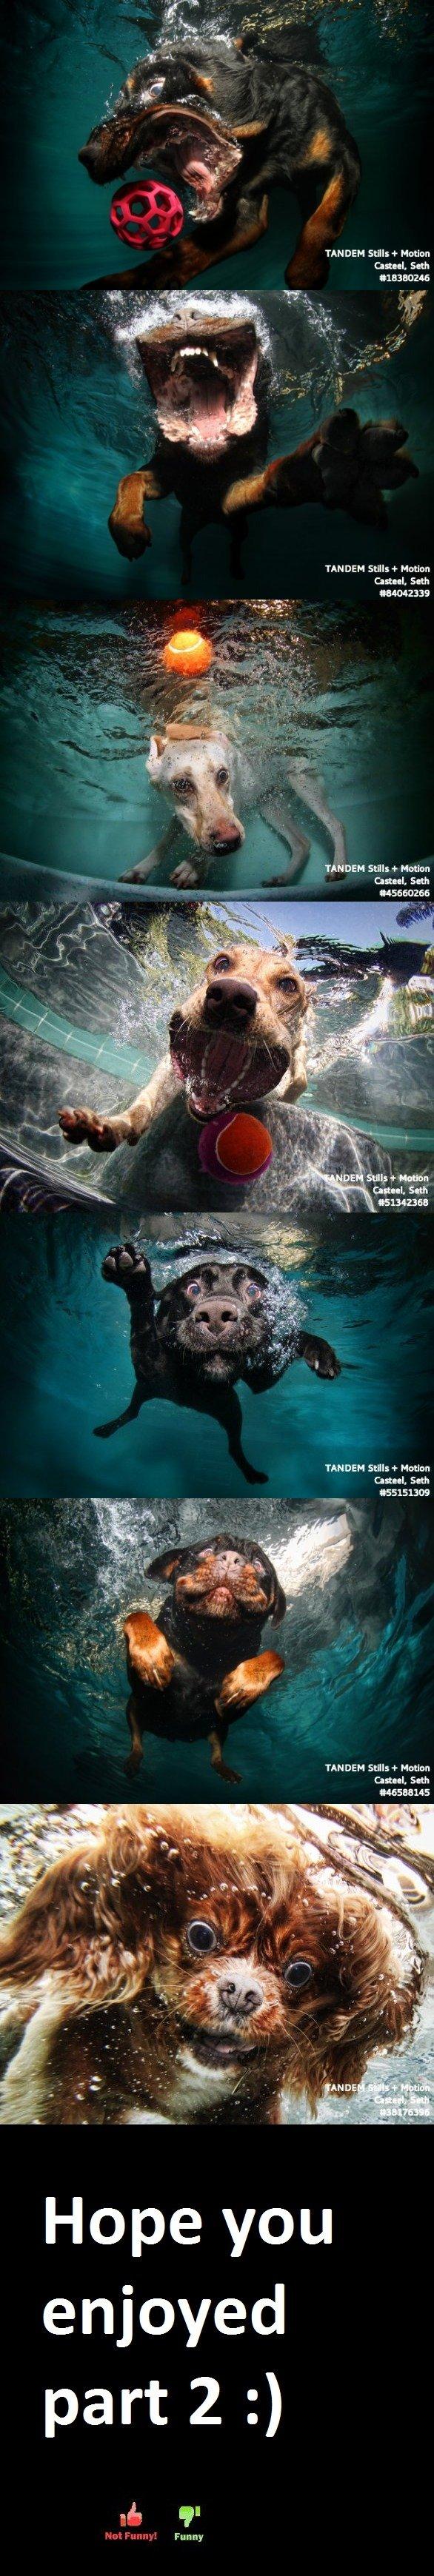 Moar Underwater Dogs!. U asked 4 more i giv u more here, has. manna ml: e Mum. anal, seth amazes TANDEM sun ' Seth amass TANDEM suns ' Manna Canal. an TANDEM su